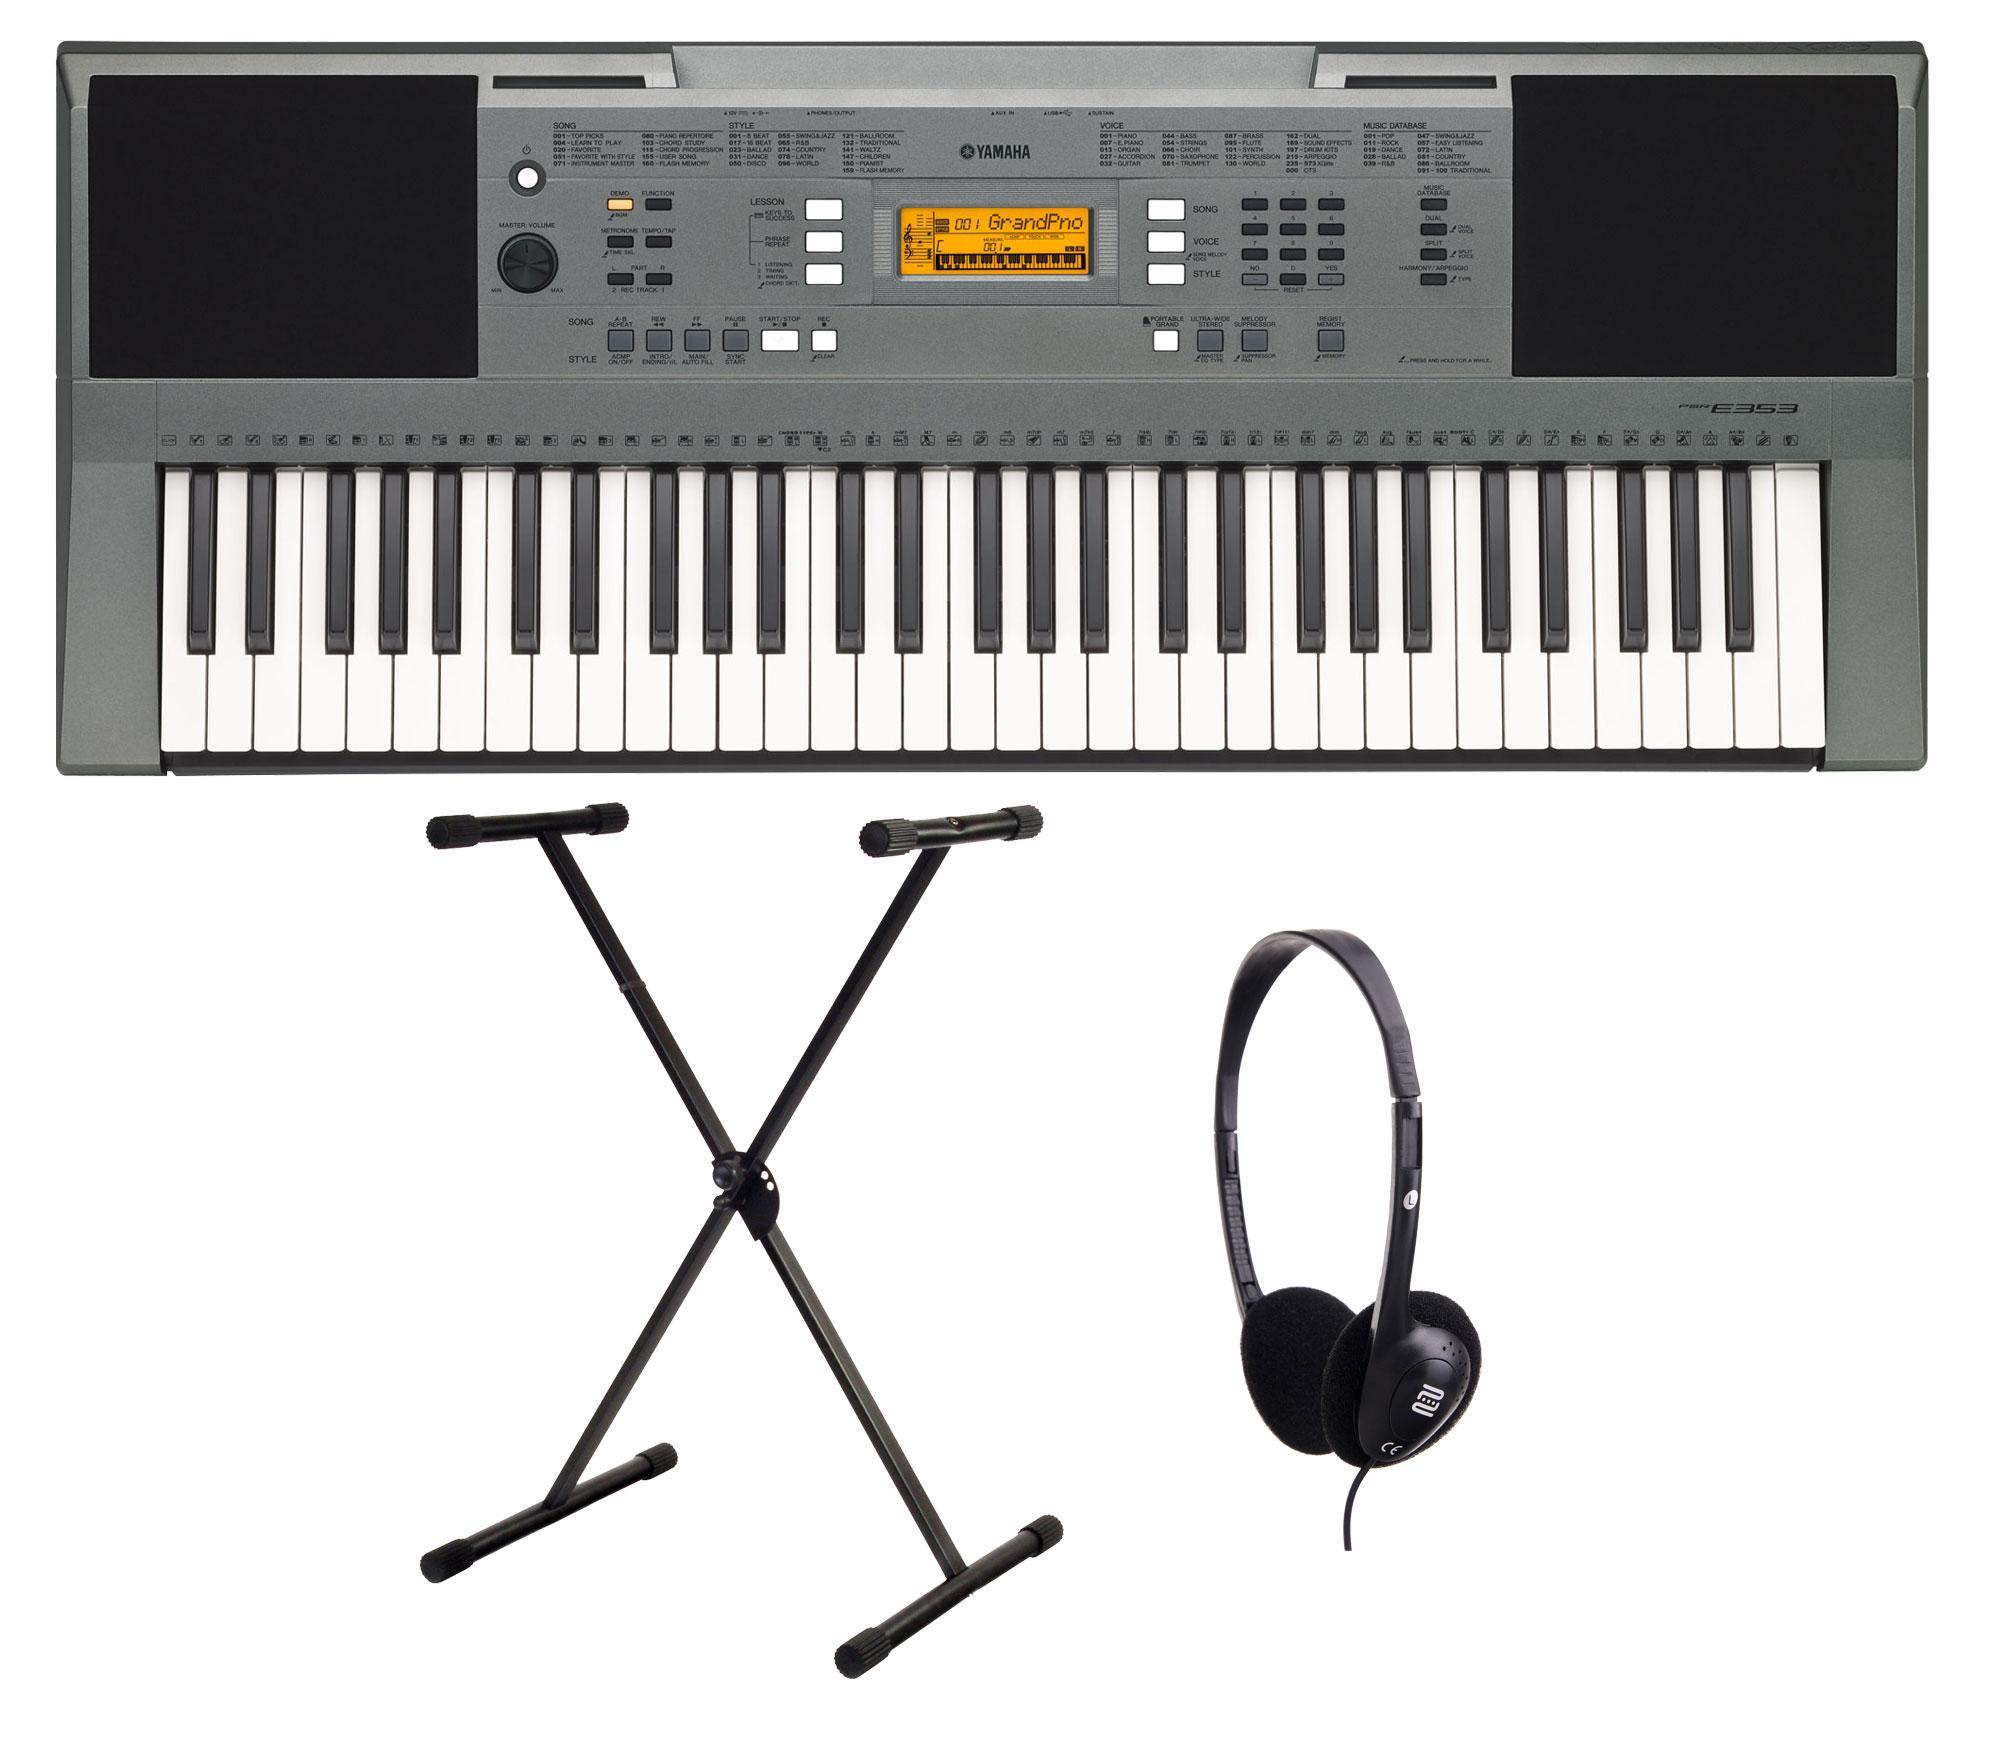 Yamaha PSR E353 Keyboard SET inkl. Ständer und Kopfhörer PSR-E353 Set